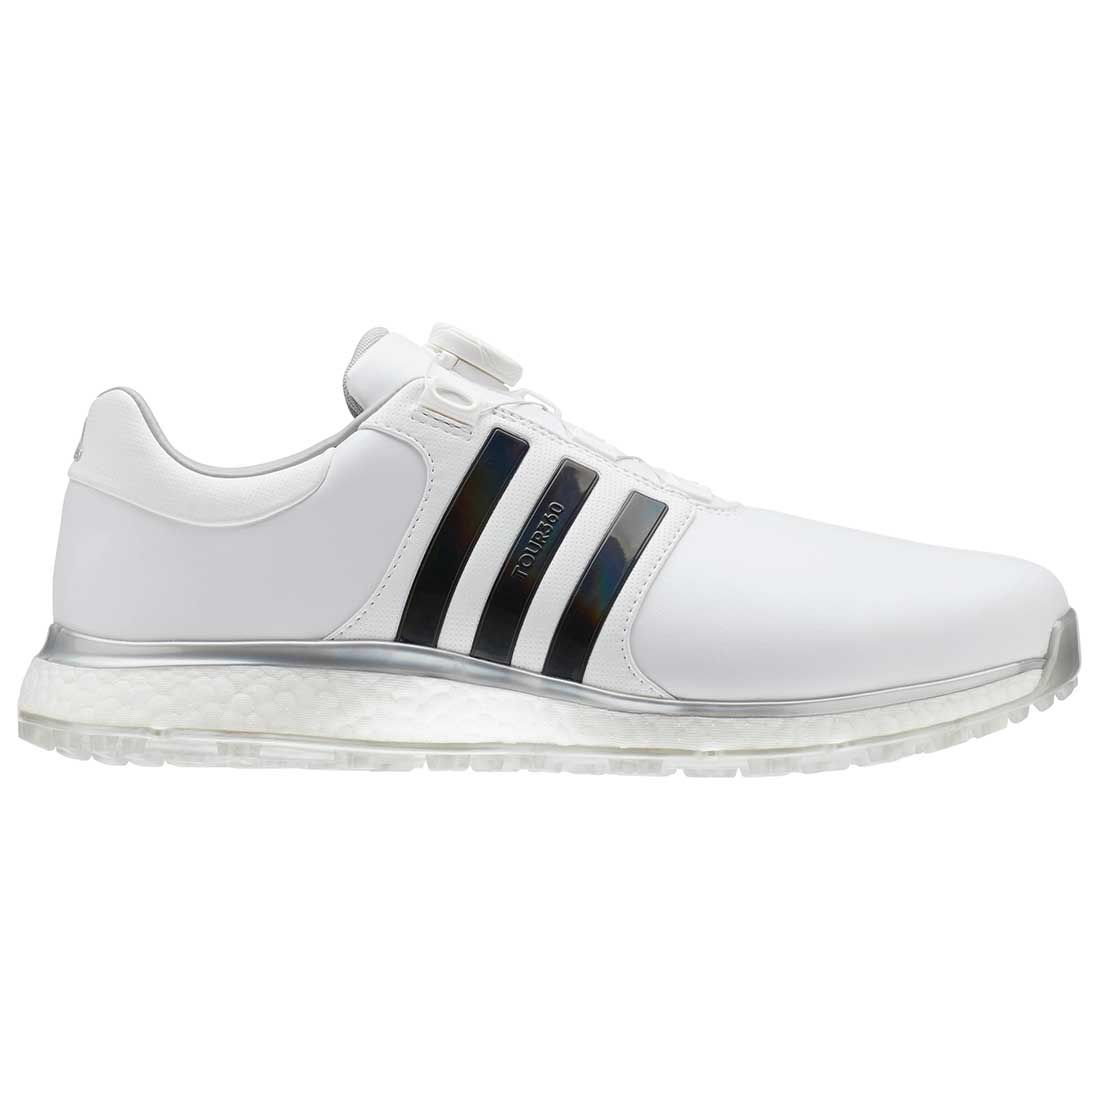 Buy Adidas Tour360 XT-SL BOA Golf Shoes